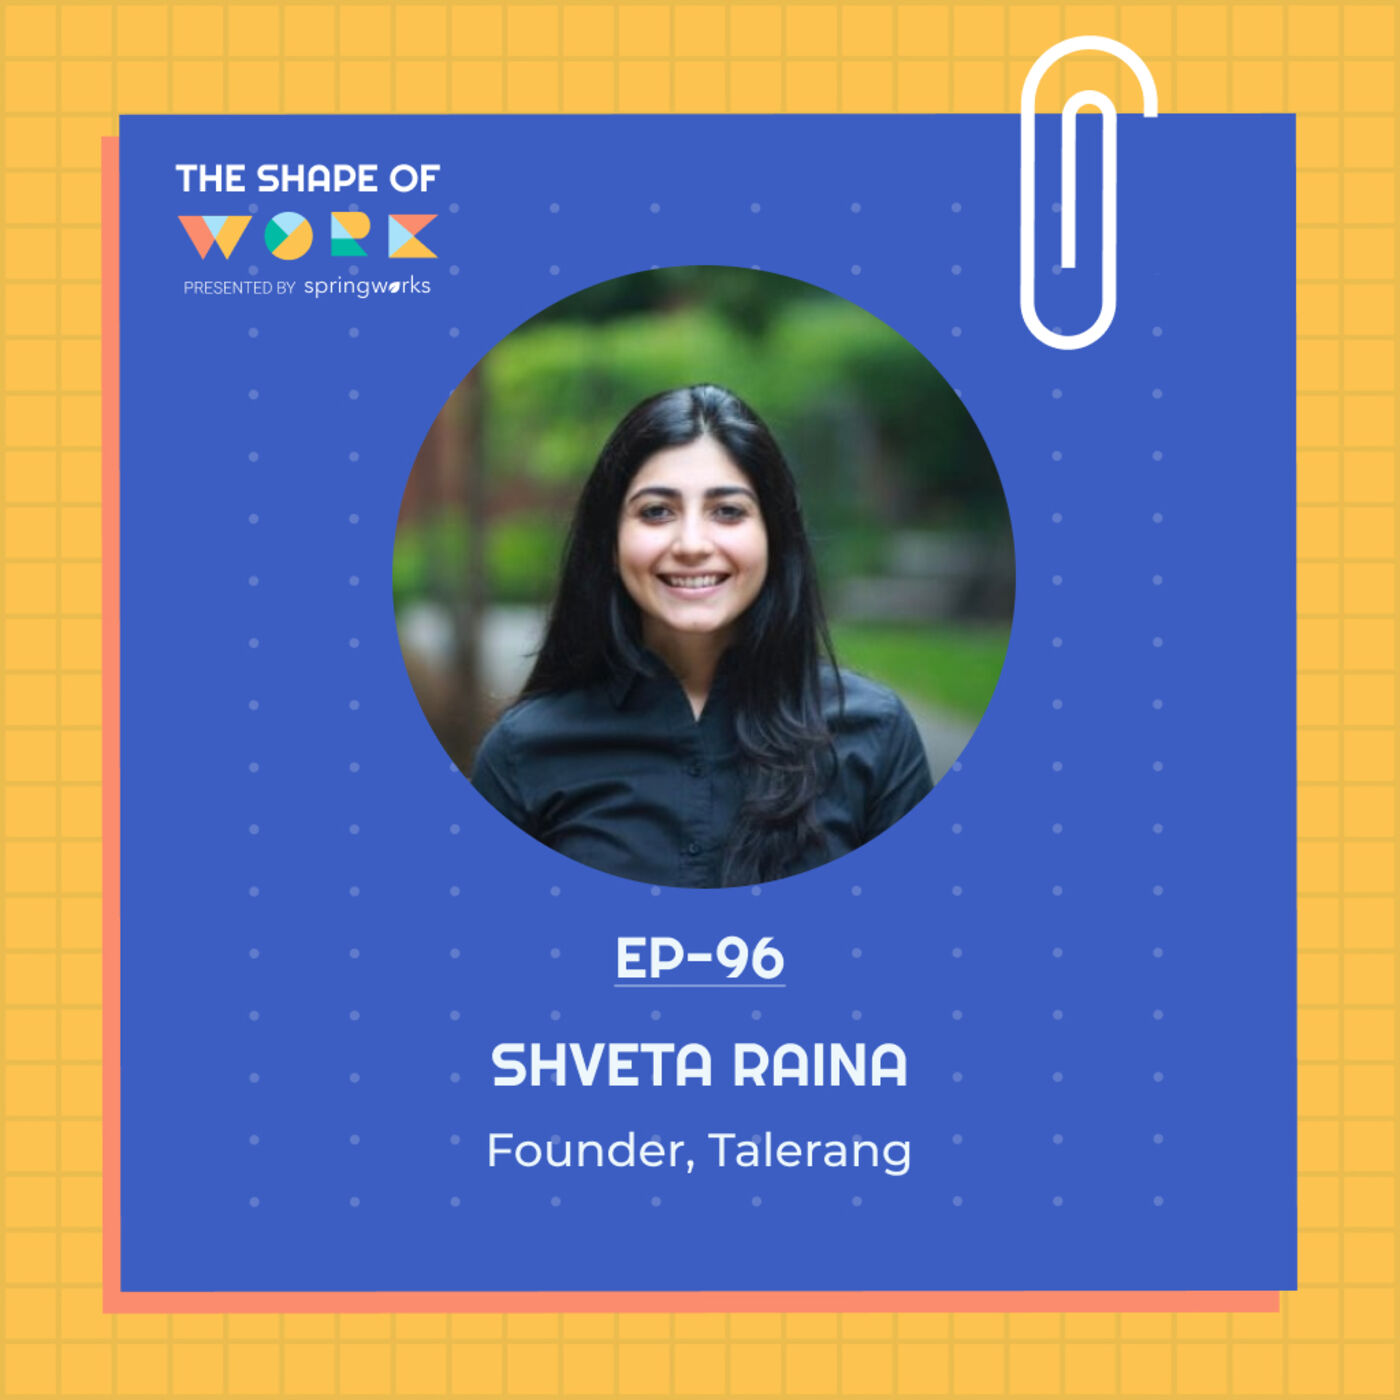 #96: Shveta Raina on why companies should hire more fresh graduates, and 21st century skills for the workforce of the future